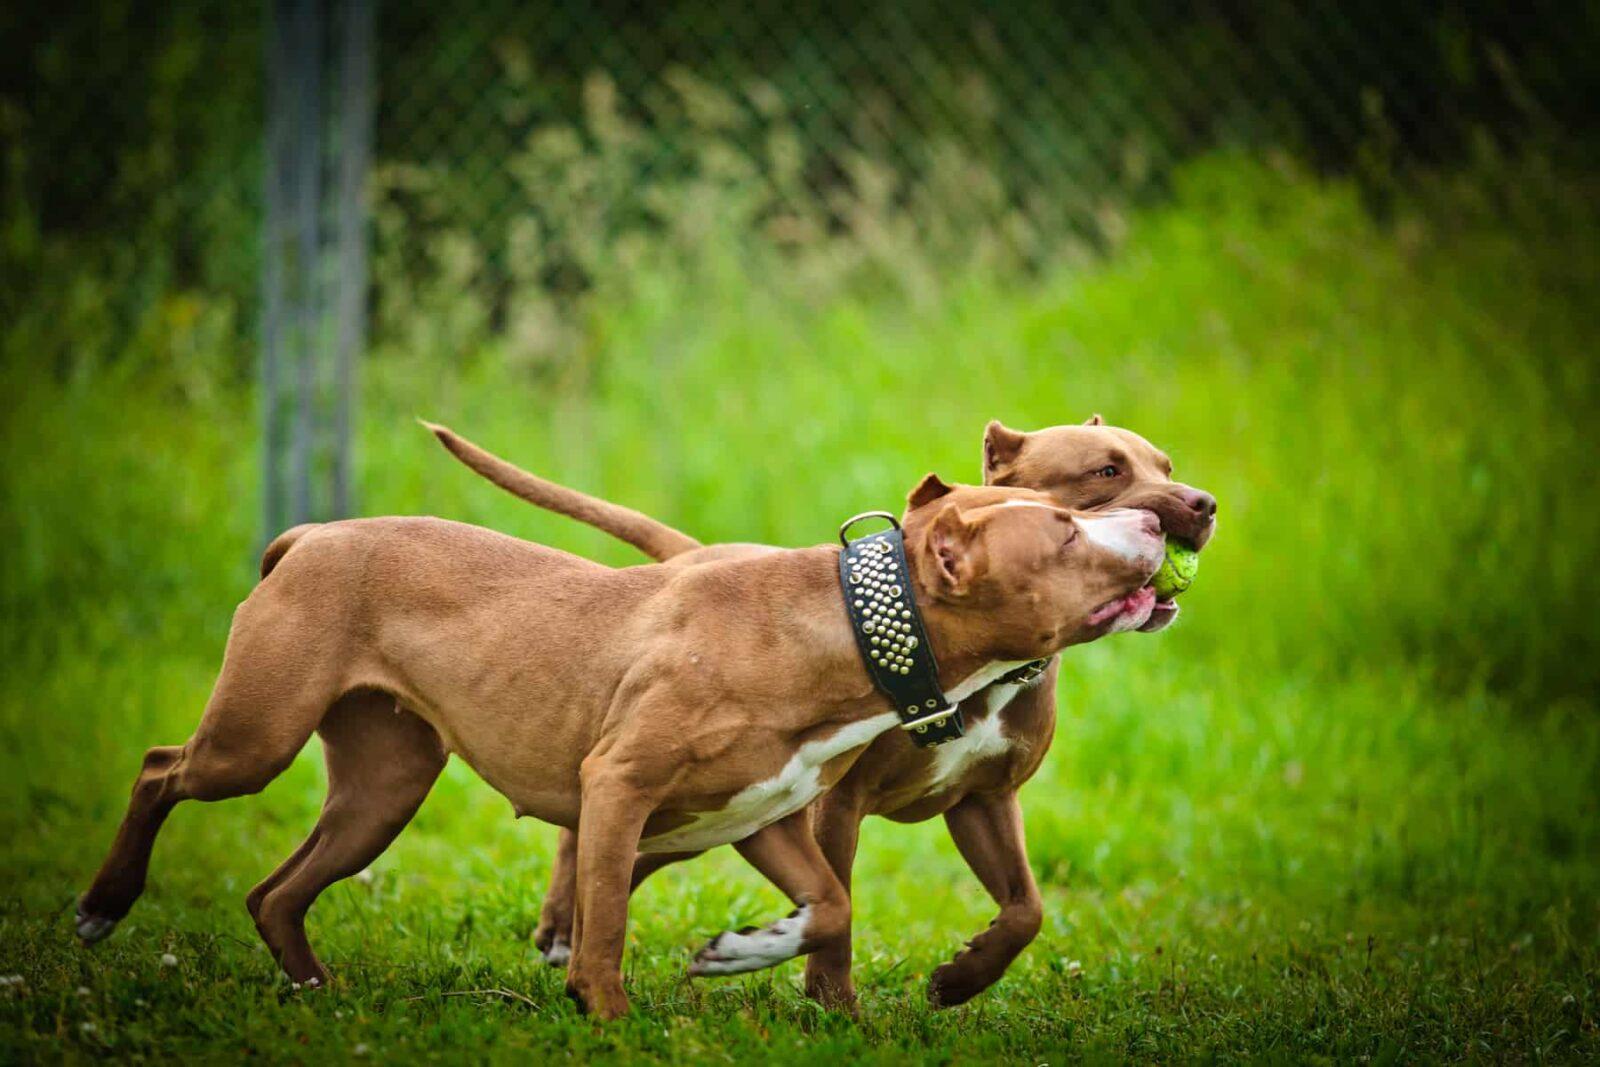 indestructible dog toys for pit bulls